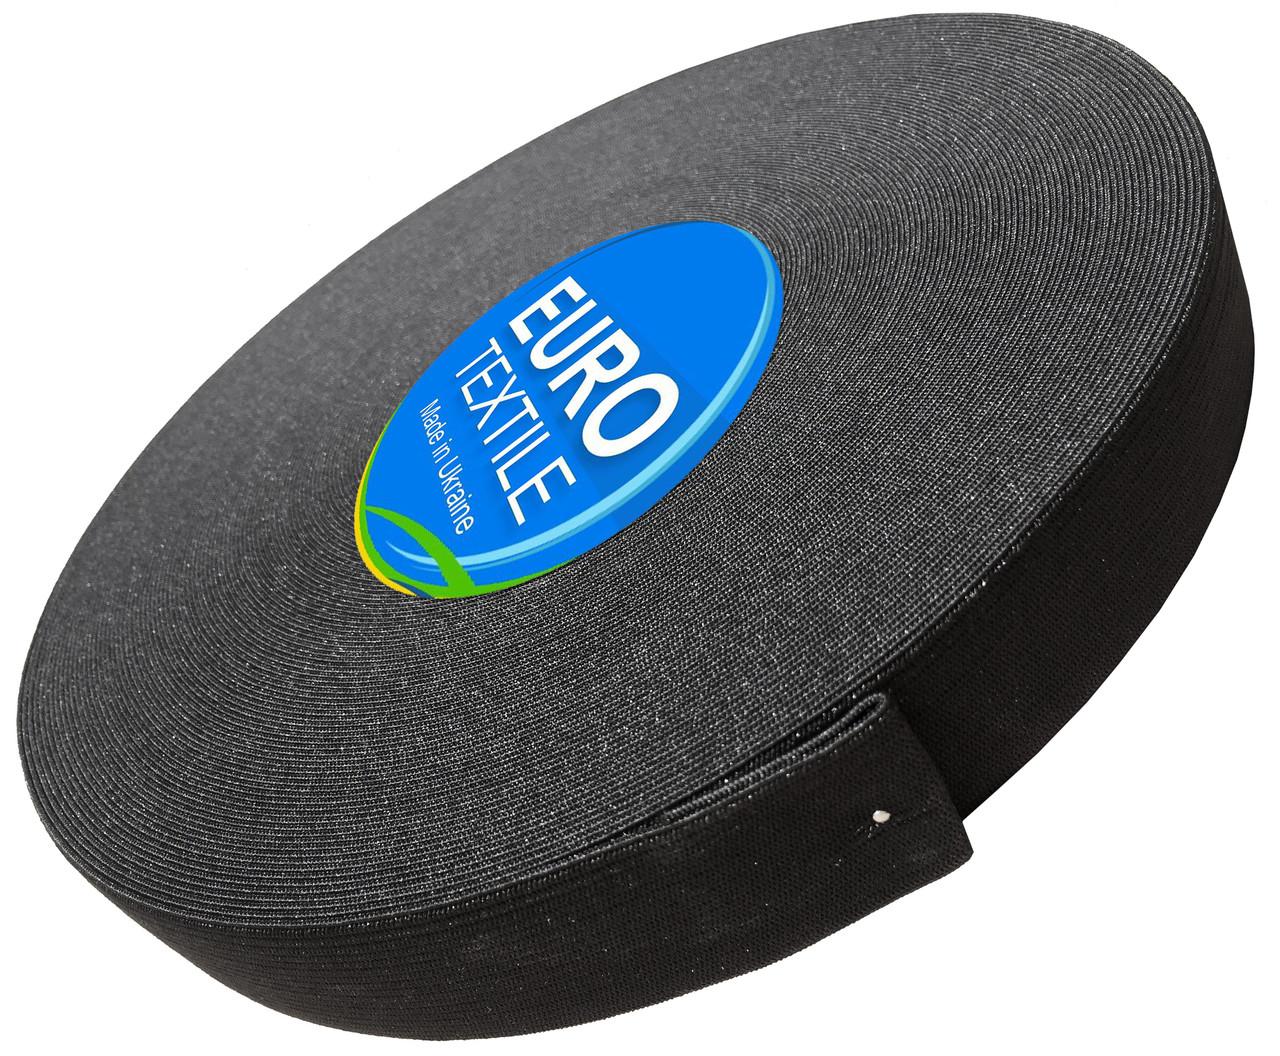 Резинки для одежды (30mm/40m) черный, тесьма эластичная полиэстер